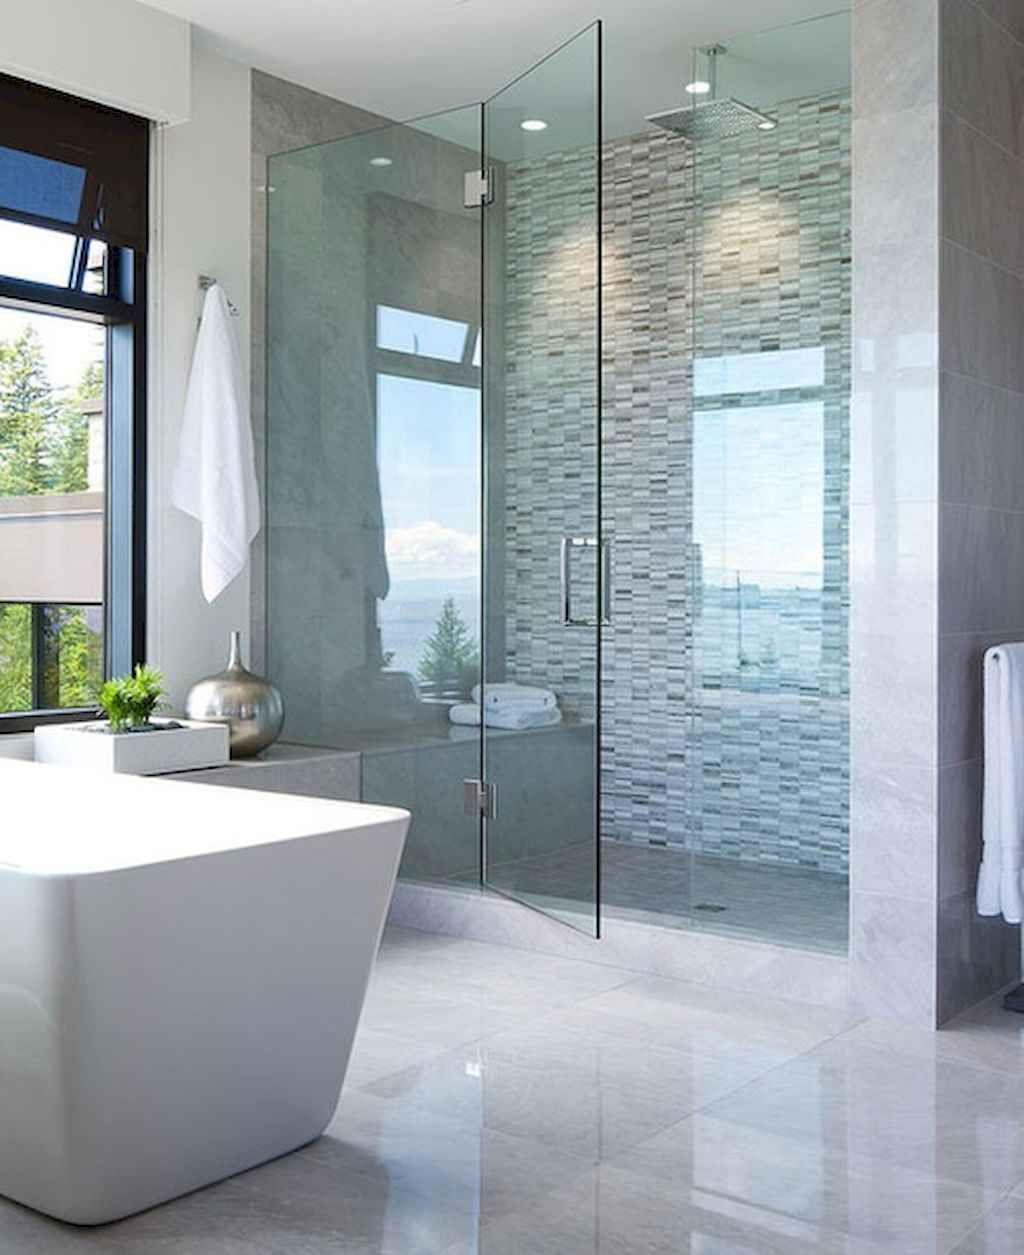 120 Favorite Bathroom Tile Shower Decor Ideas Worldecor Co Small Apartment Bathroom Modern Master Bathroom Contemporary Master Bathroom Master bedroom badroom tiles design